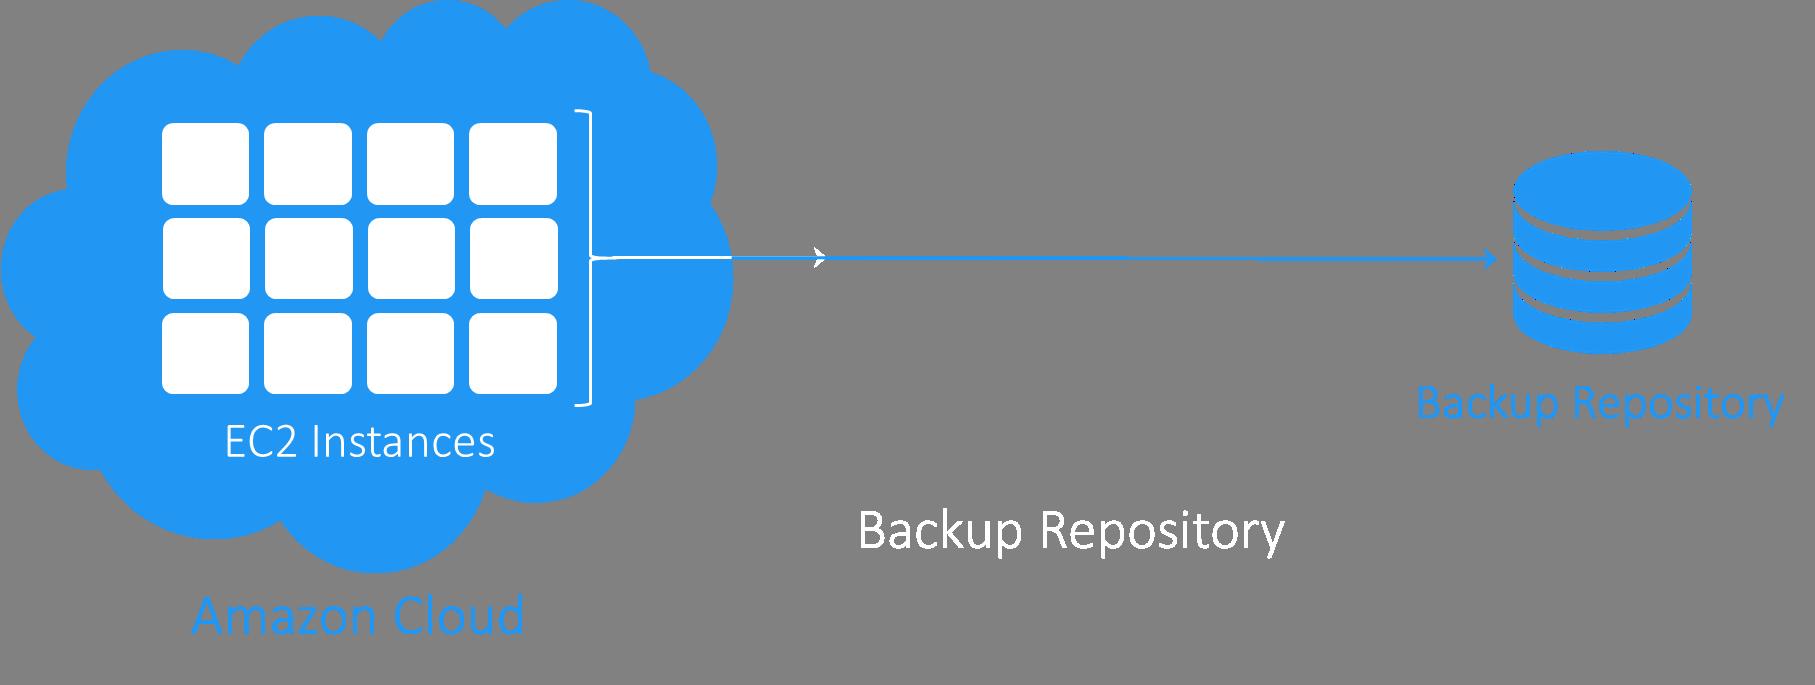 AWS EC2 Instance Backup